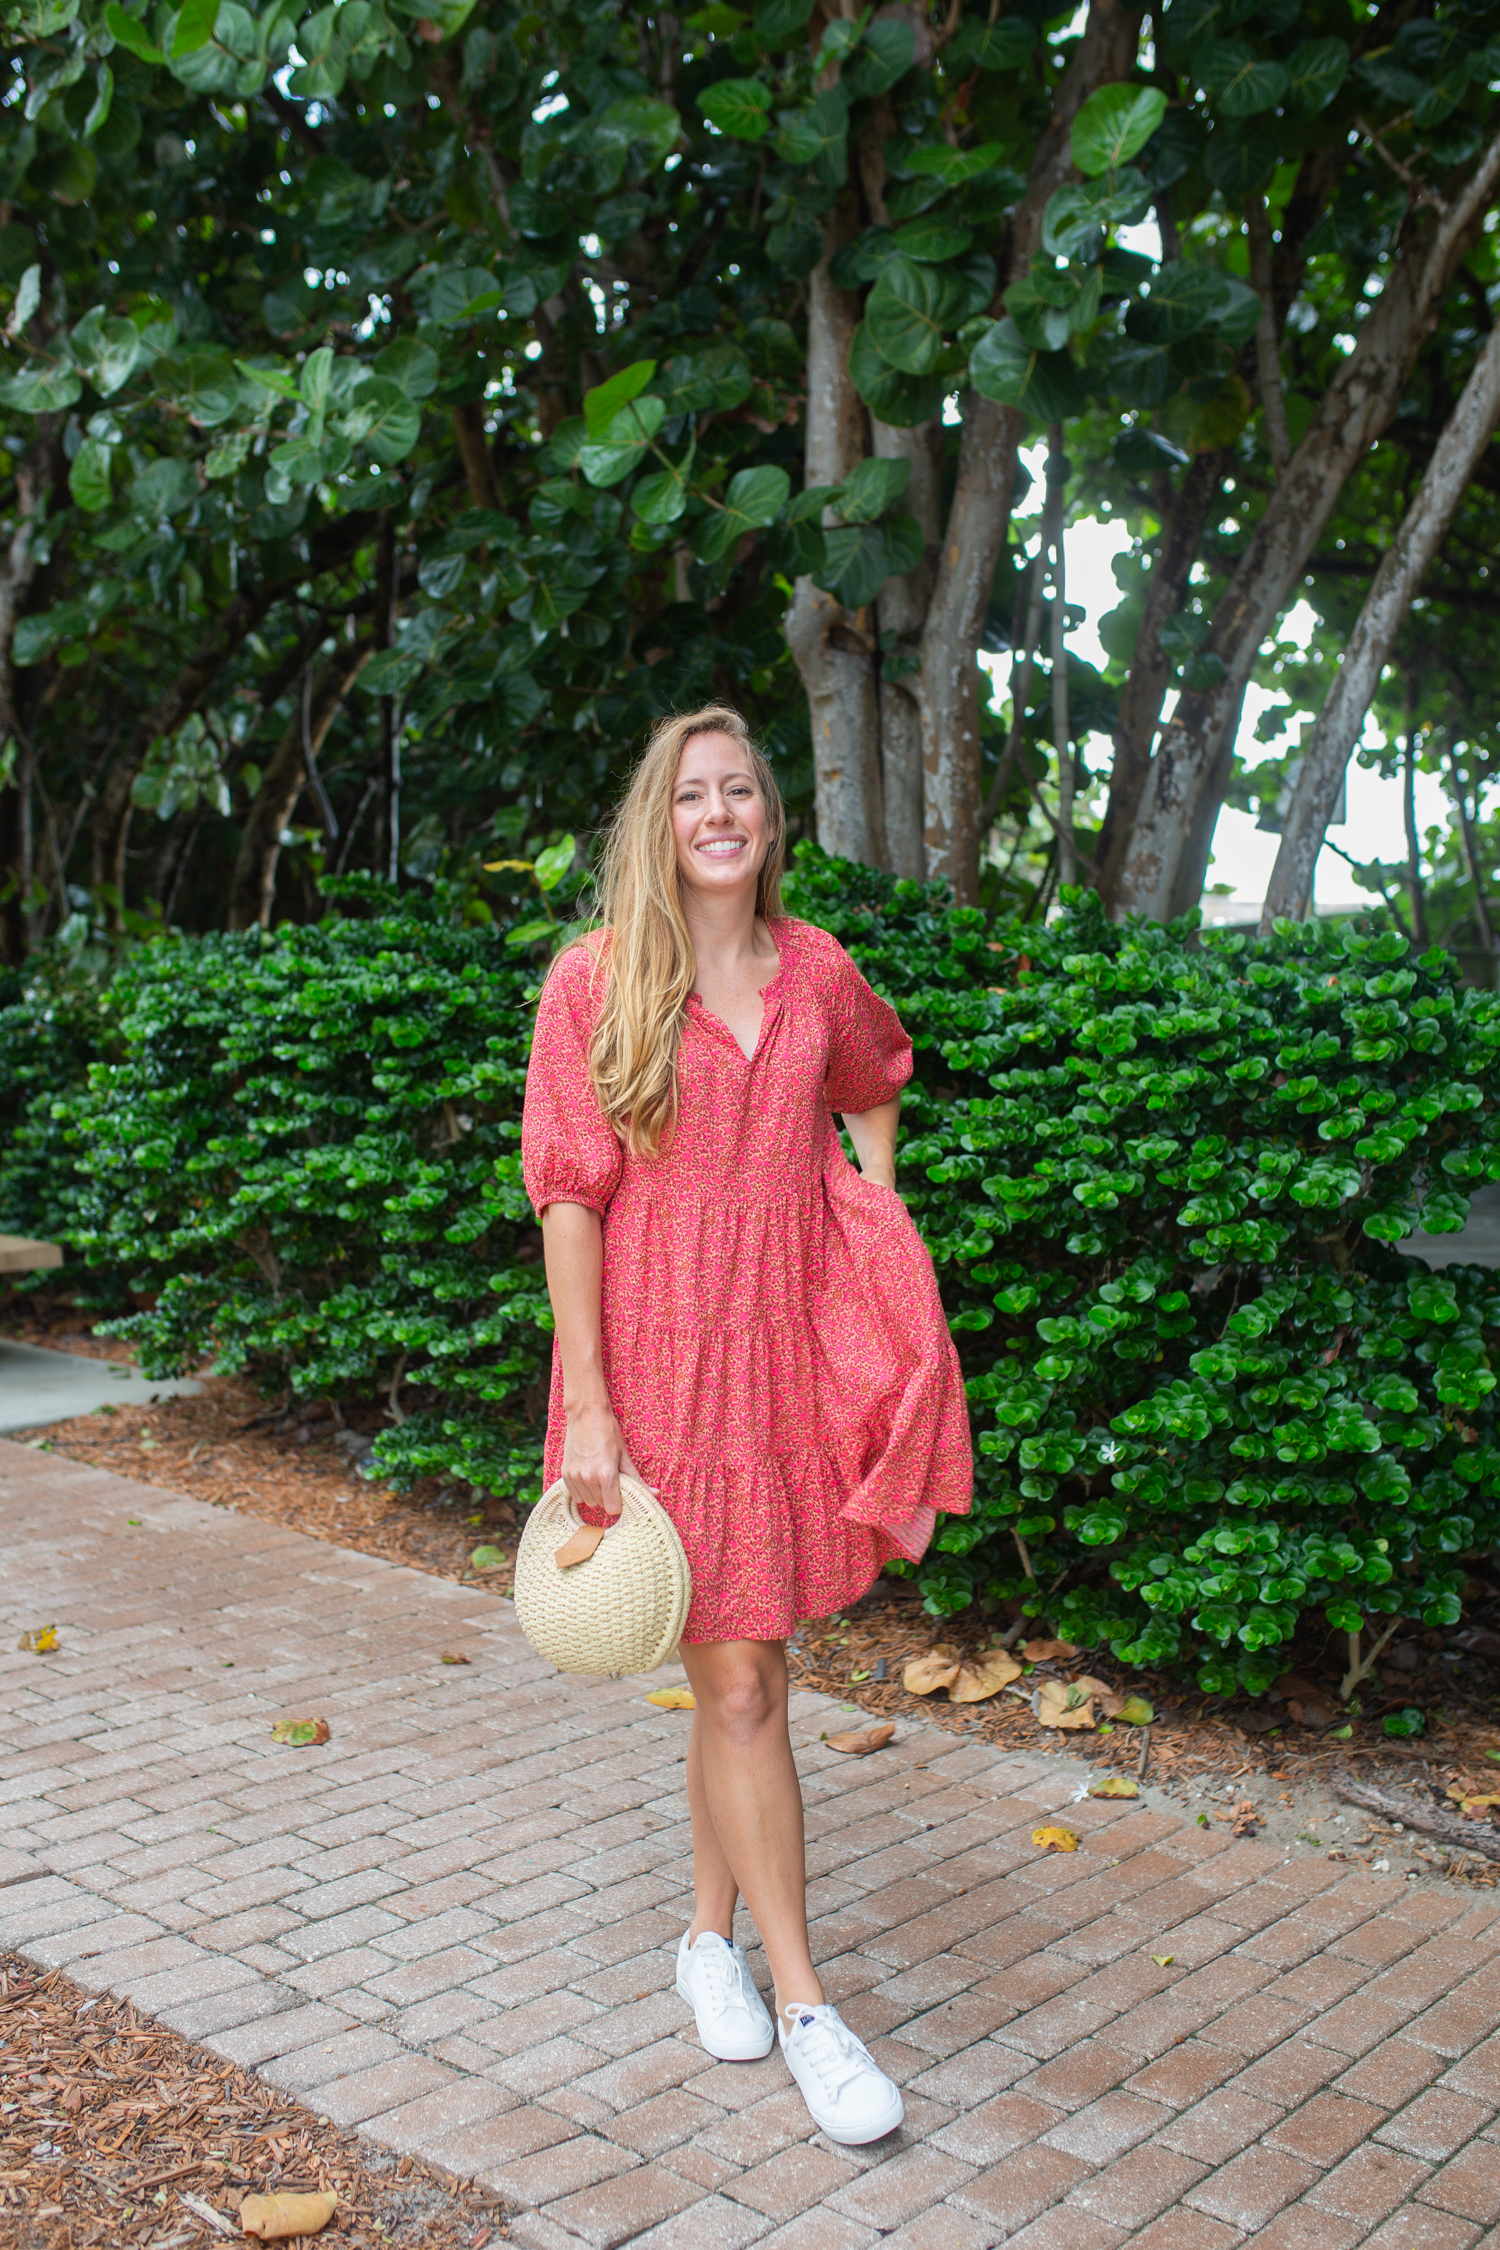 Puff Sleeve Babydoll Dress / How to Style a Dress with Sneakers / Fall Dress / White Sneakers / Fall Outfit Inspiration - Sunshine Style, A Coastal Fashion and Lifestyle Blog